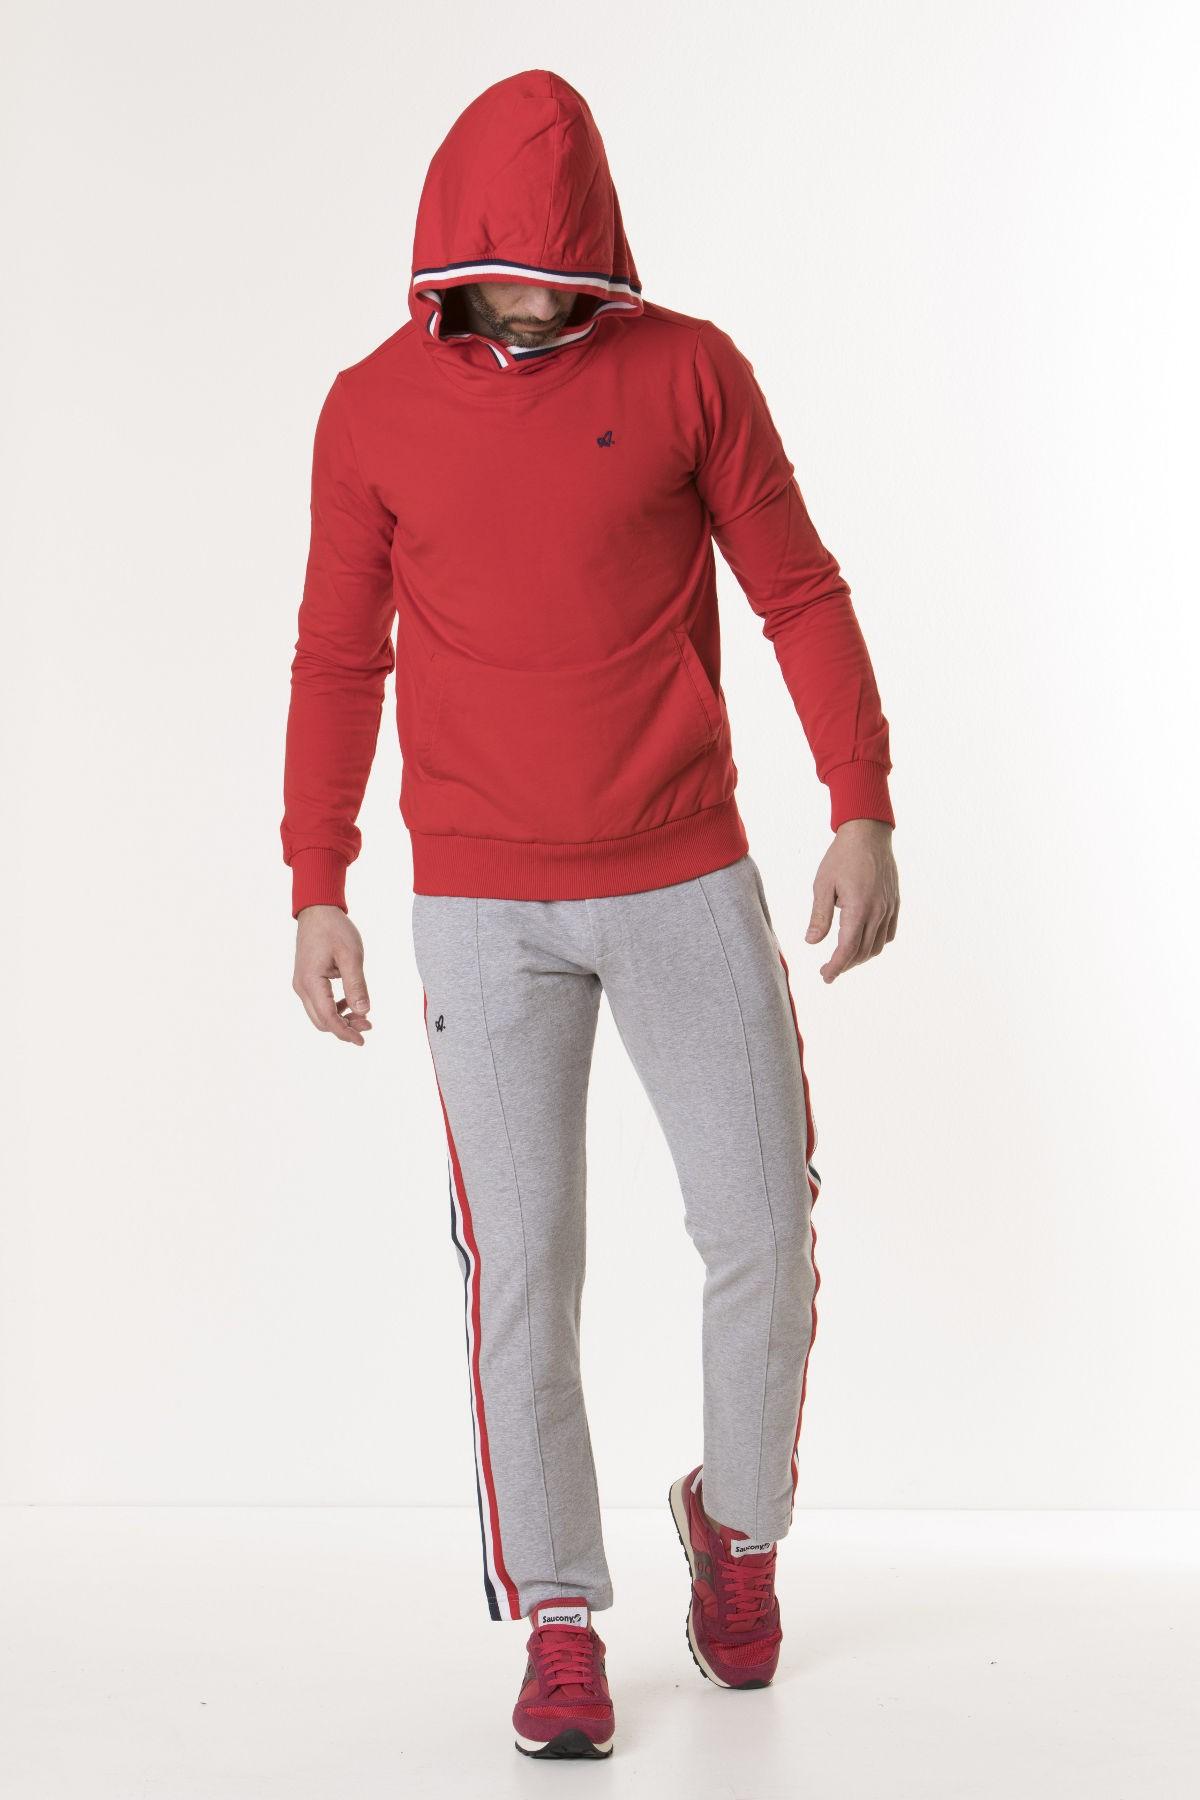 Sweatshirt for man RED COURT AUSTRALIAN S/S 18